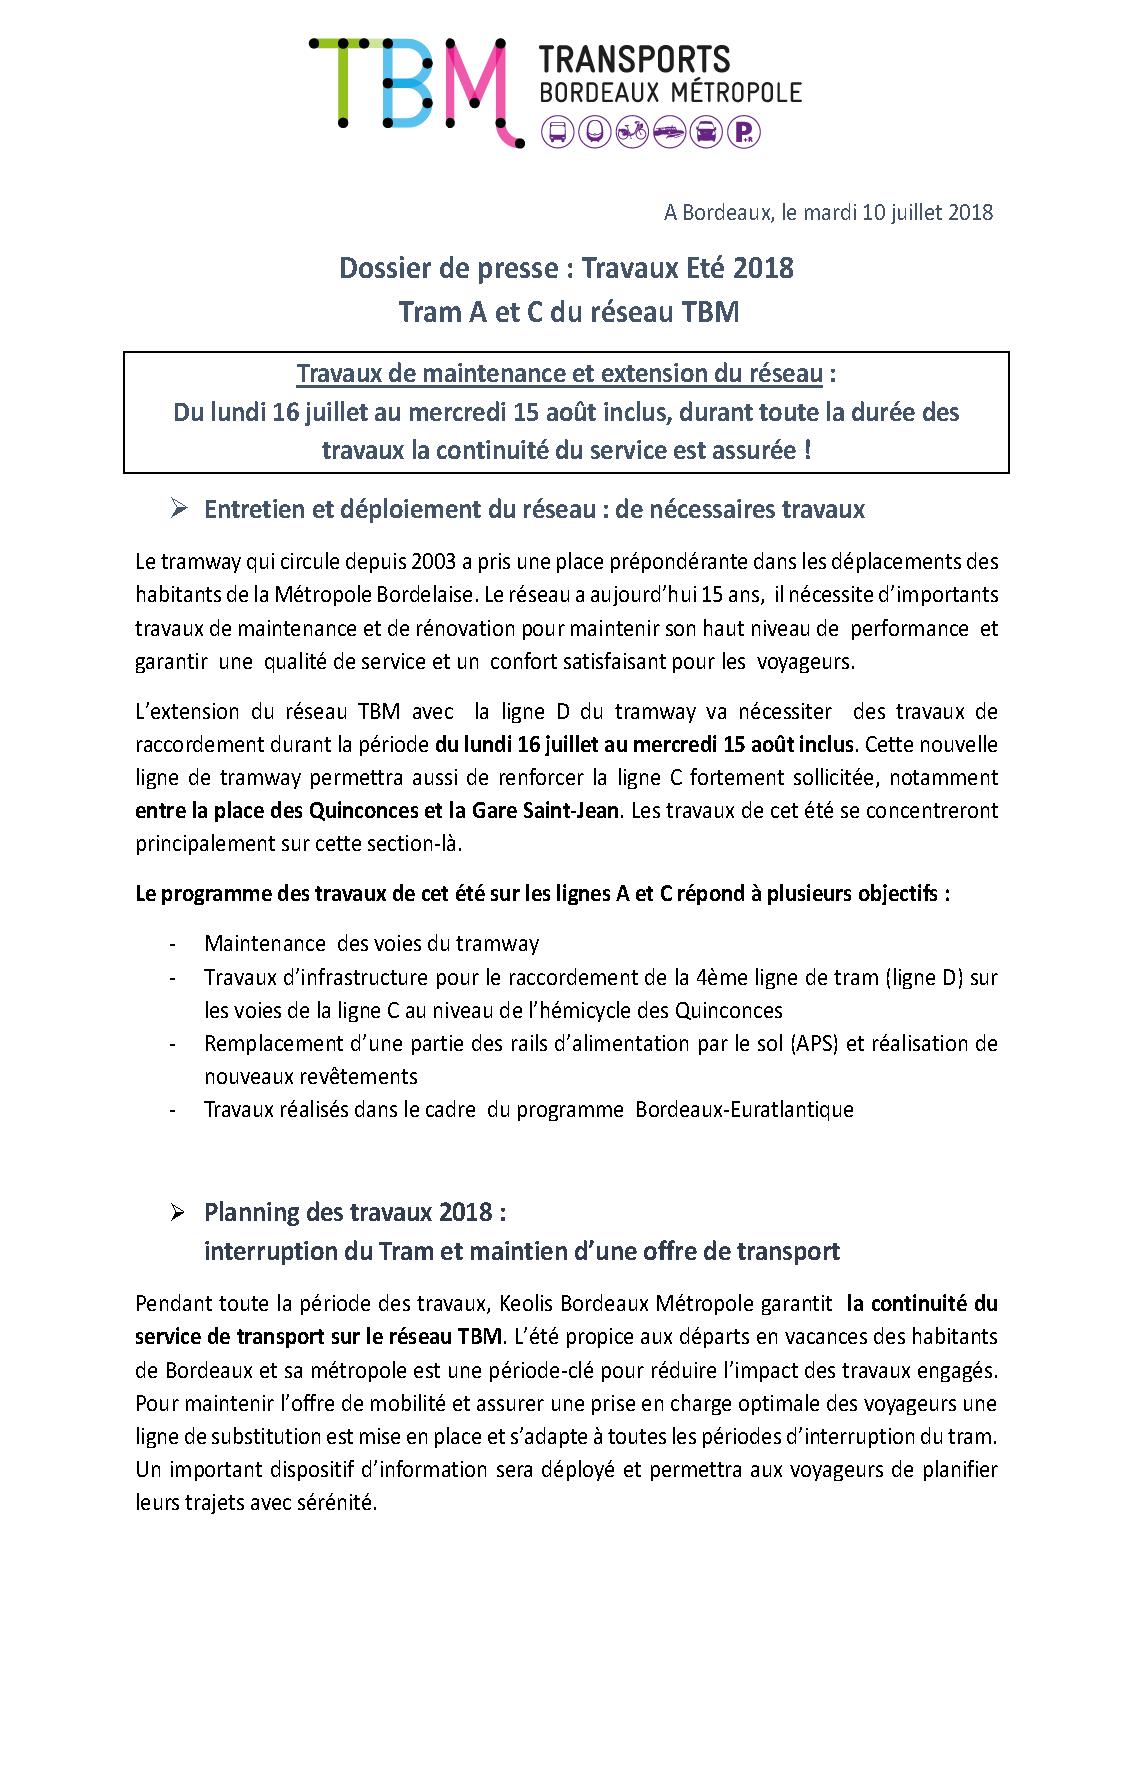 dp-travaux-ete-reseau-tbm-10-07-2018_page_01